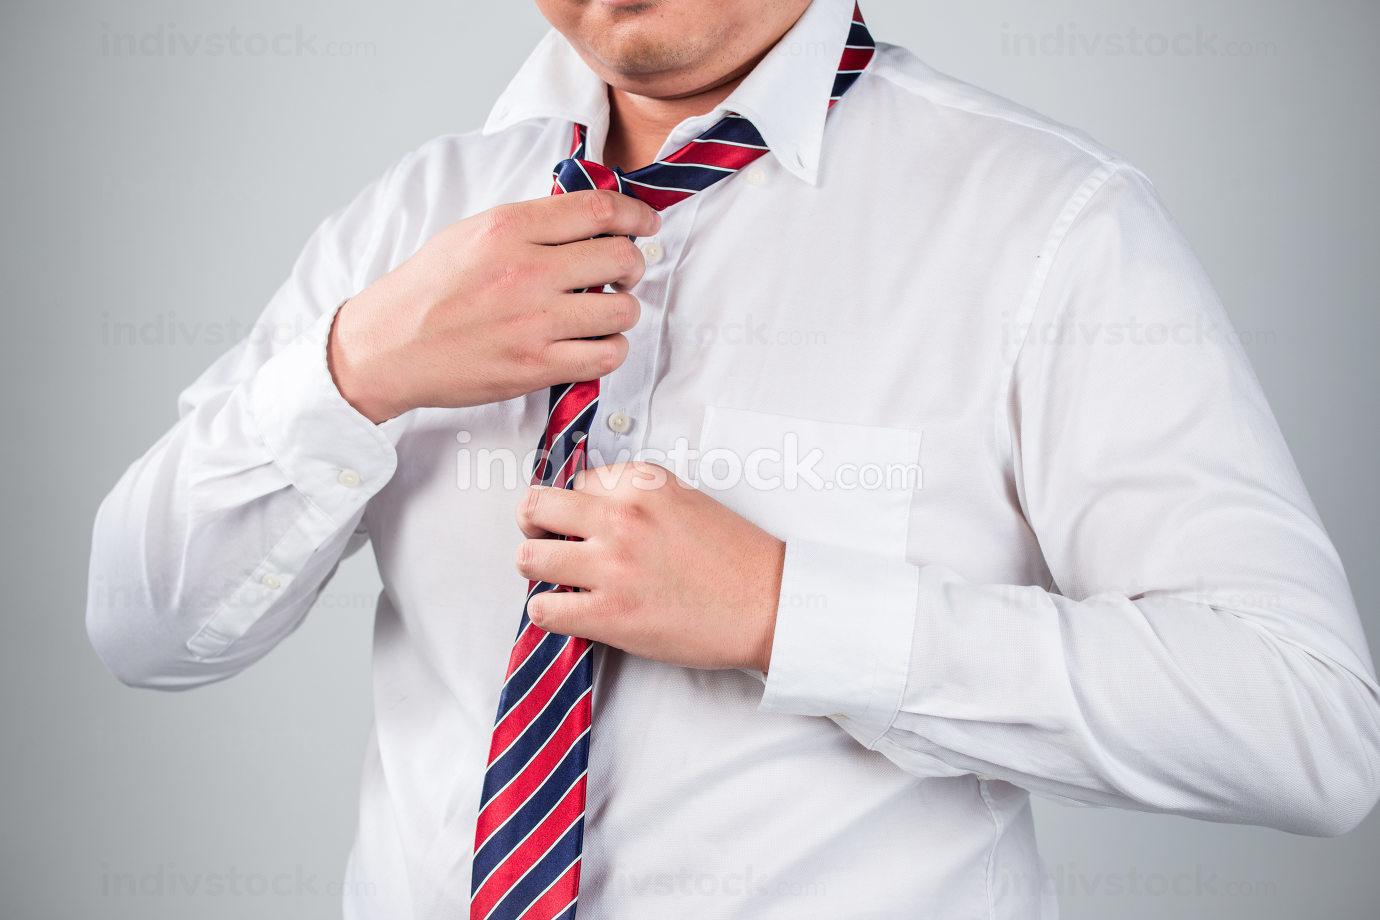 Businessman in blue suit tying the necktie  good